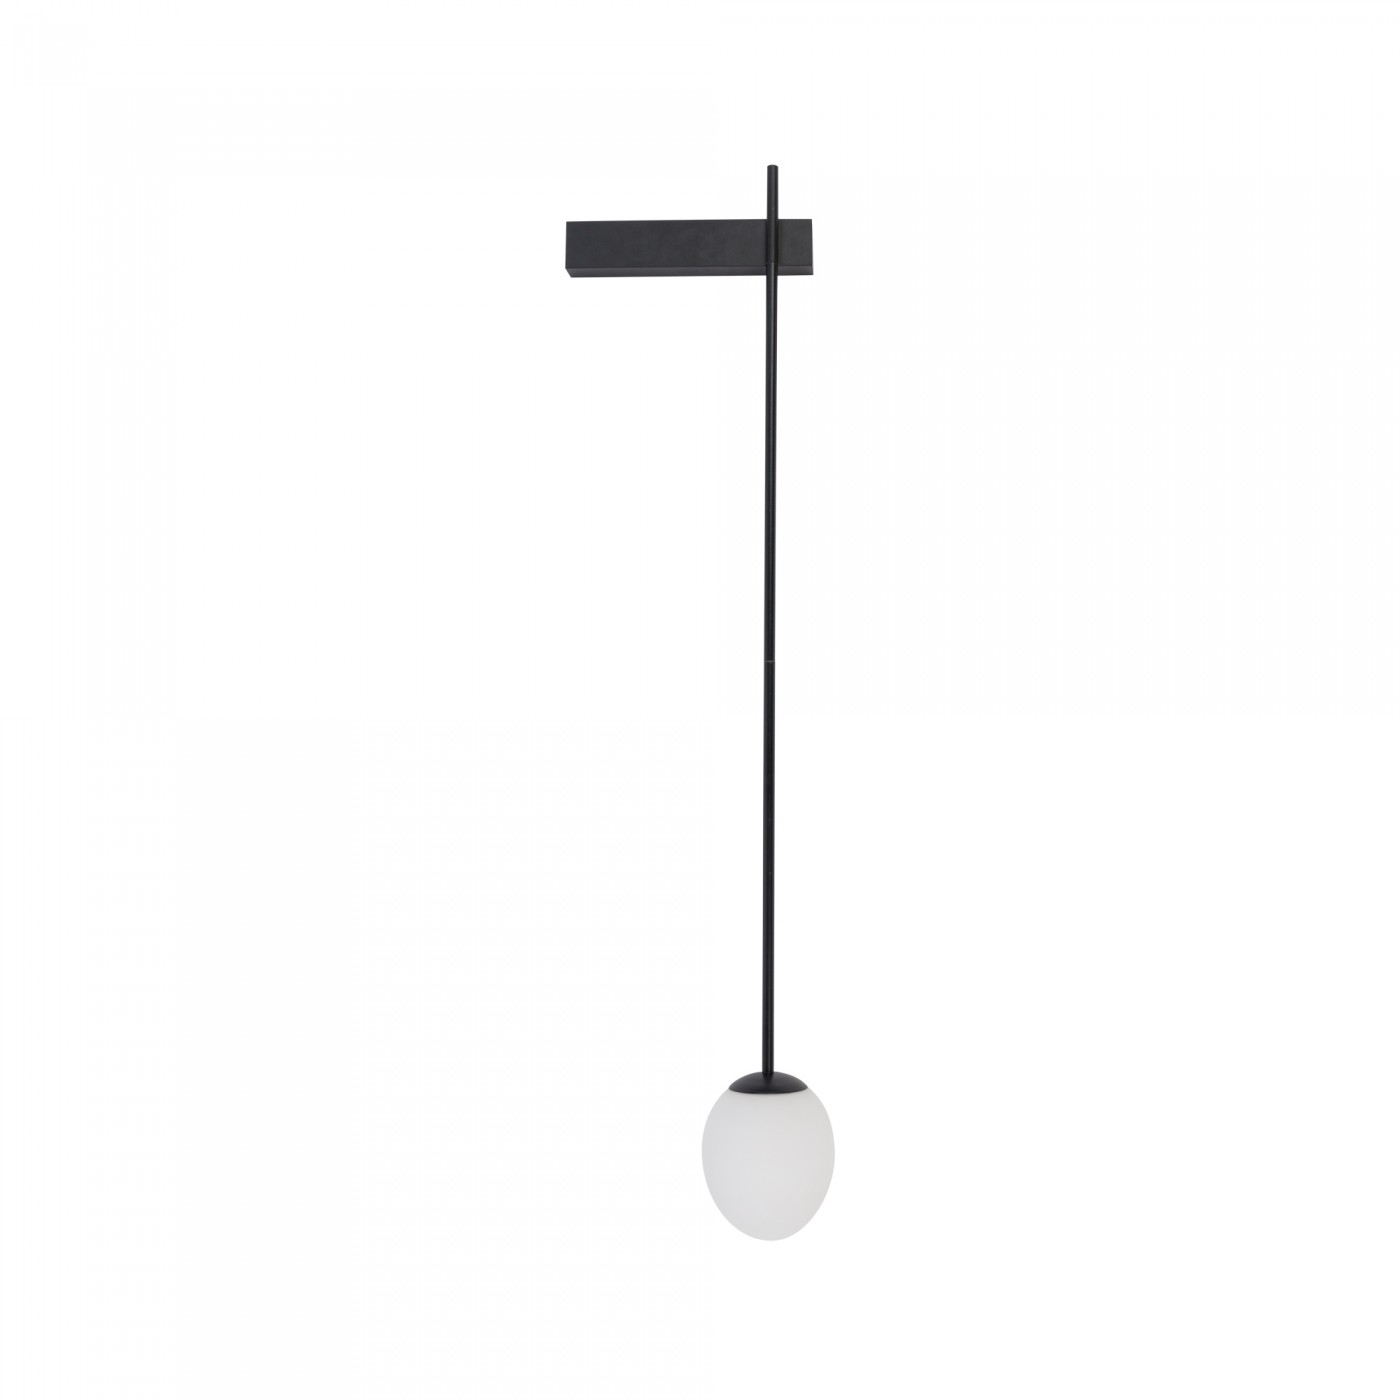 ICE EGG B black 8125 Nowodvorski Lighting